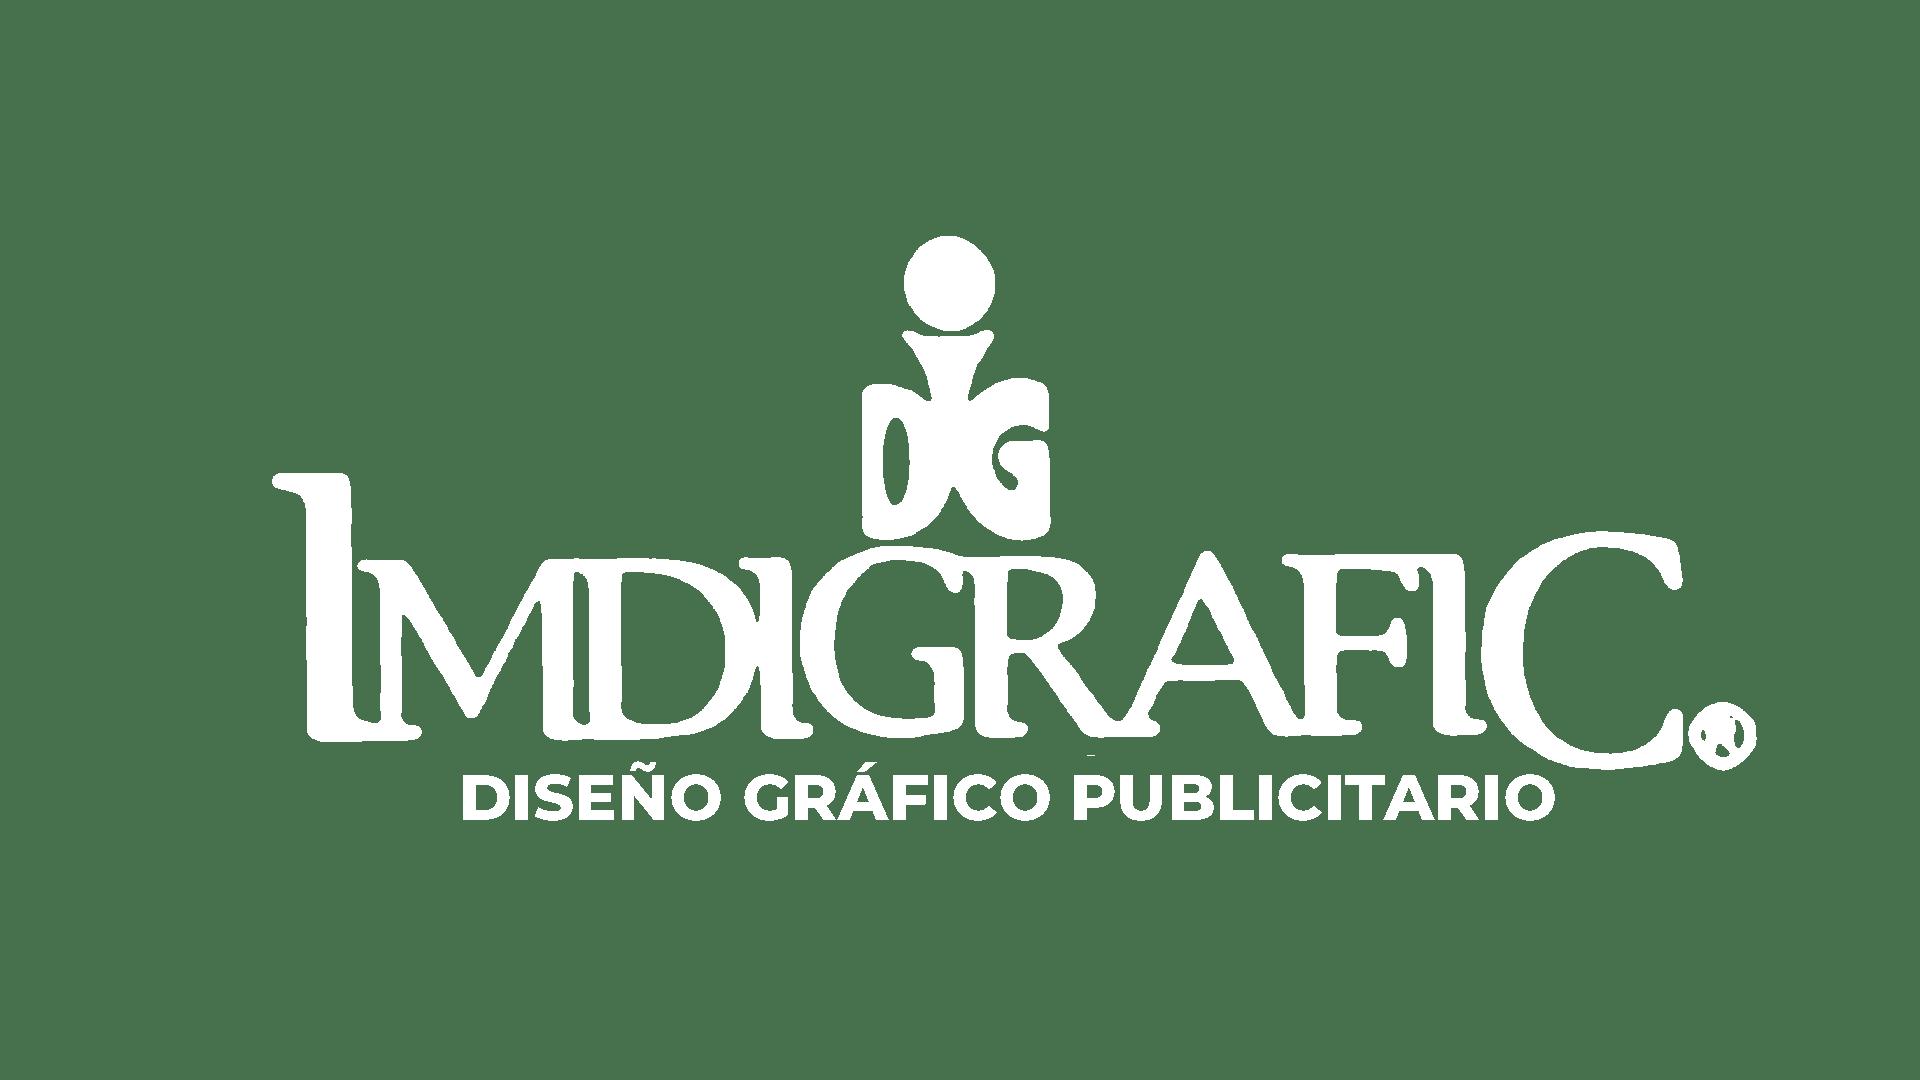 IMDIGRAFIC